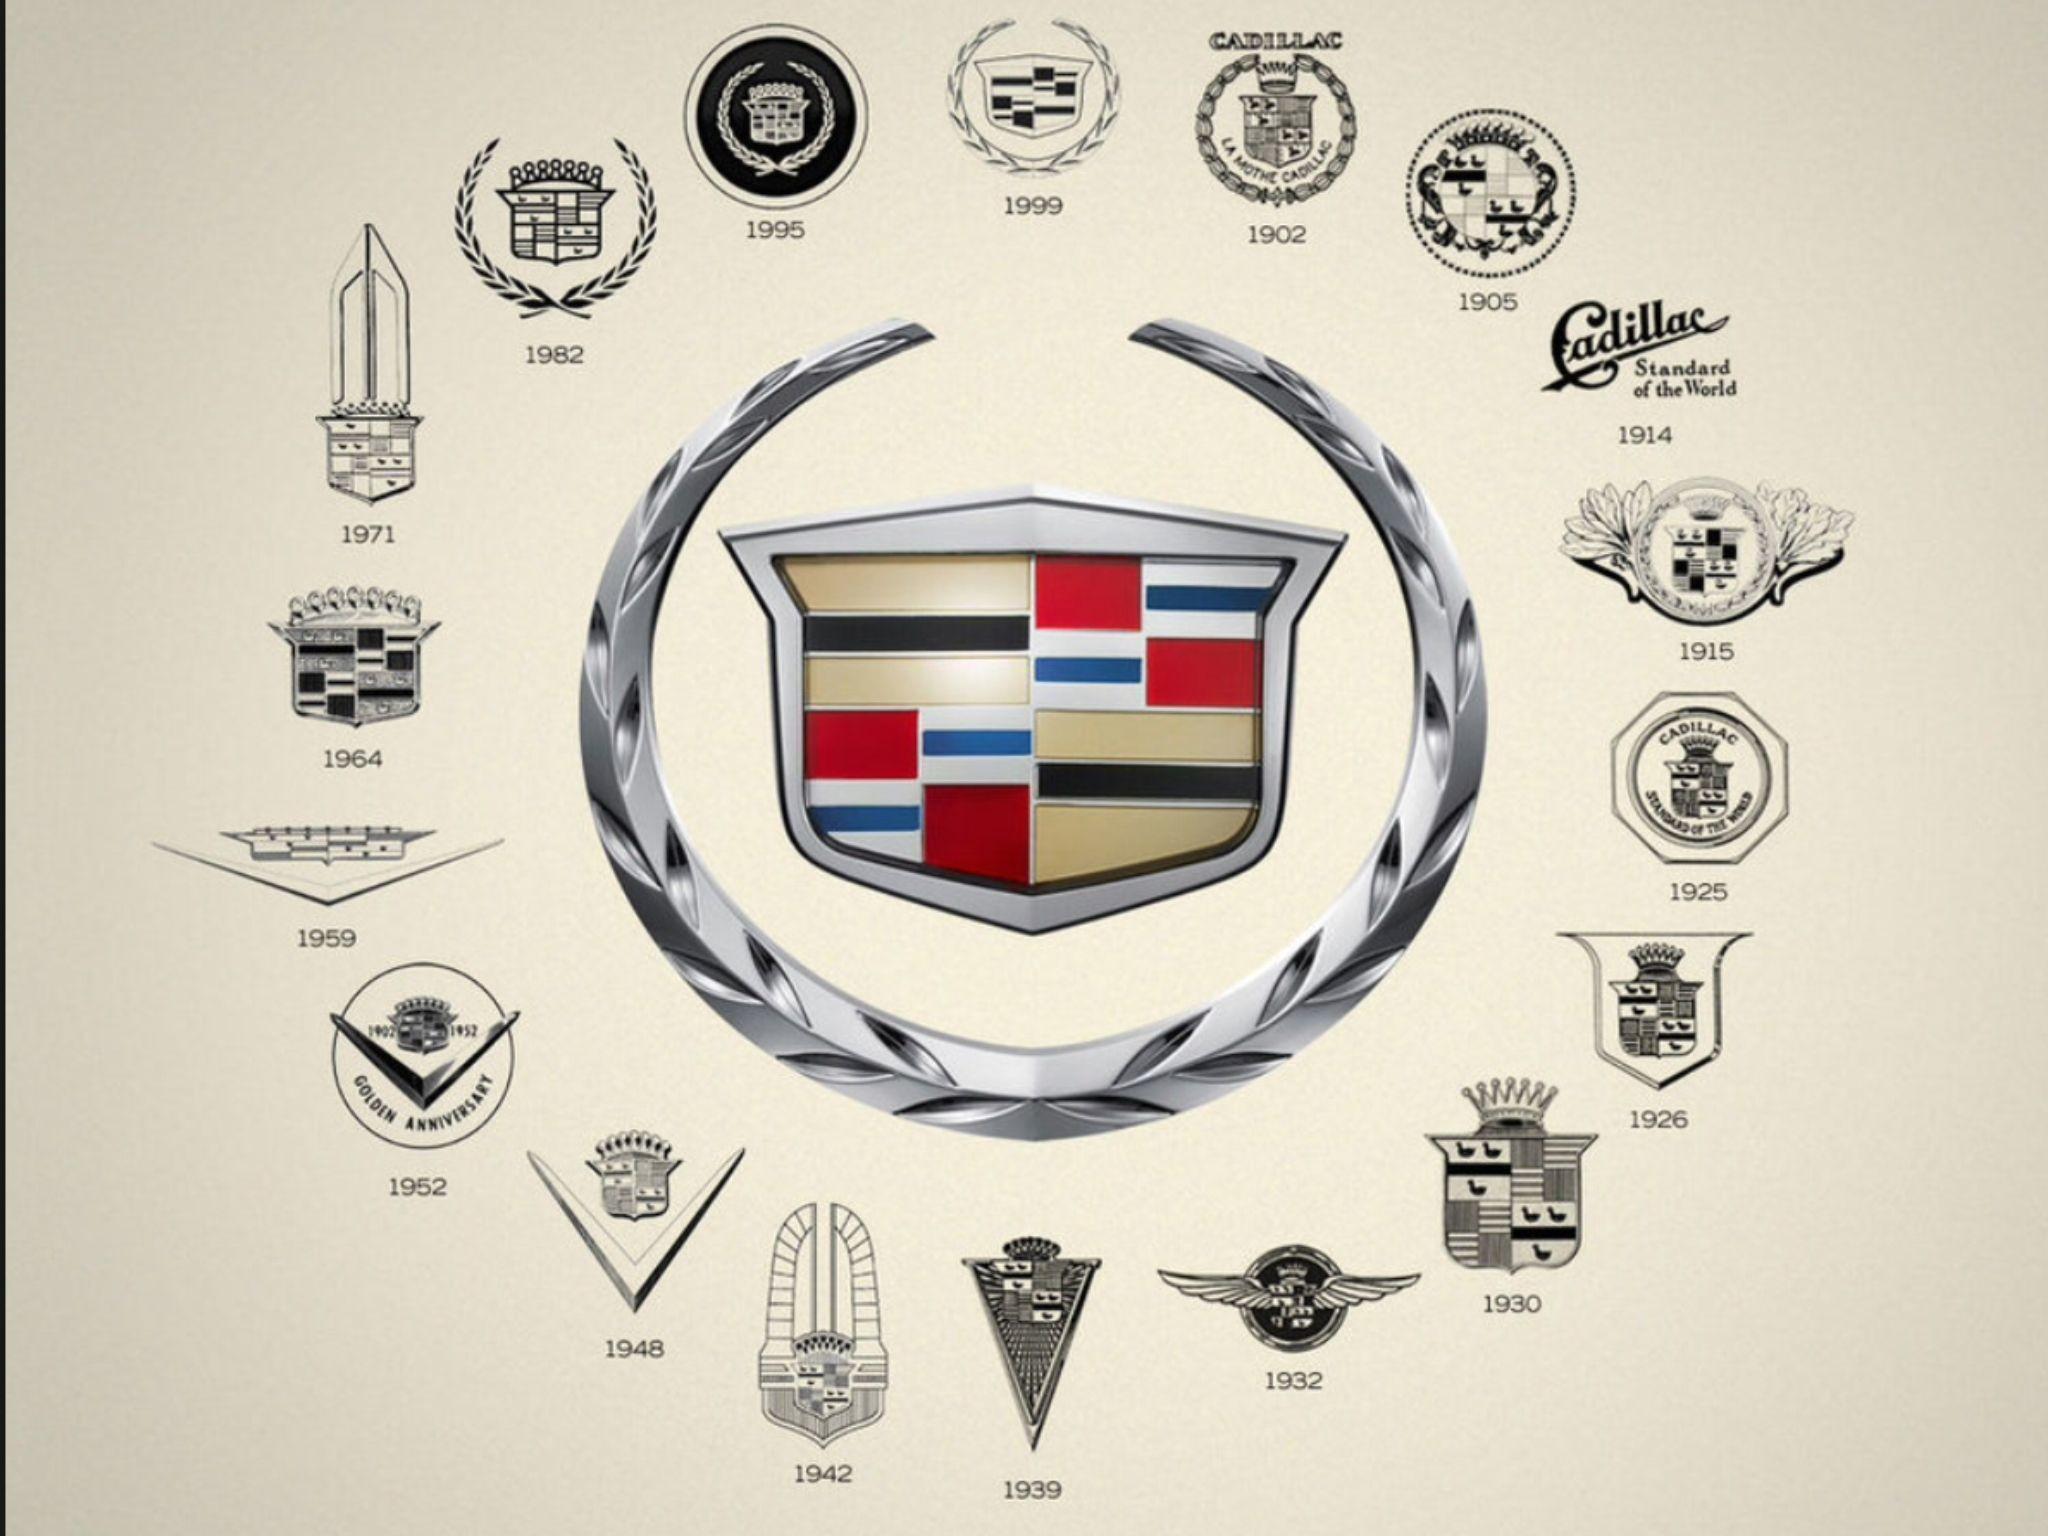 Cadillac Logo Wallpapers Top Free Cadillac Logo Backgrounds Wallpaperaccess